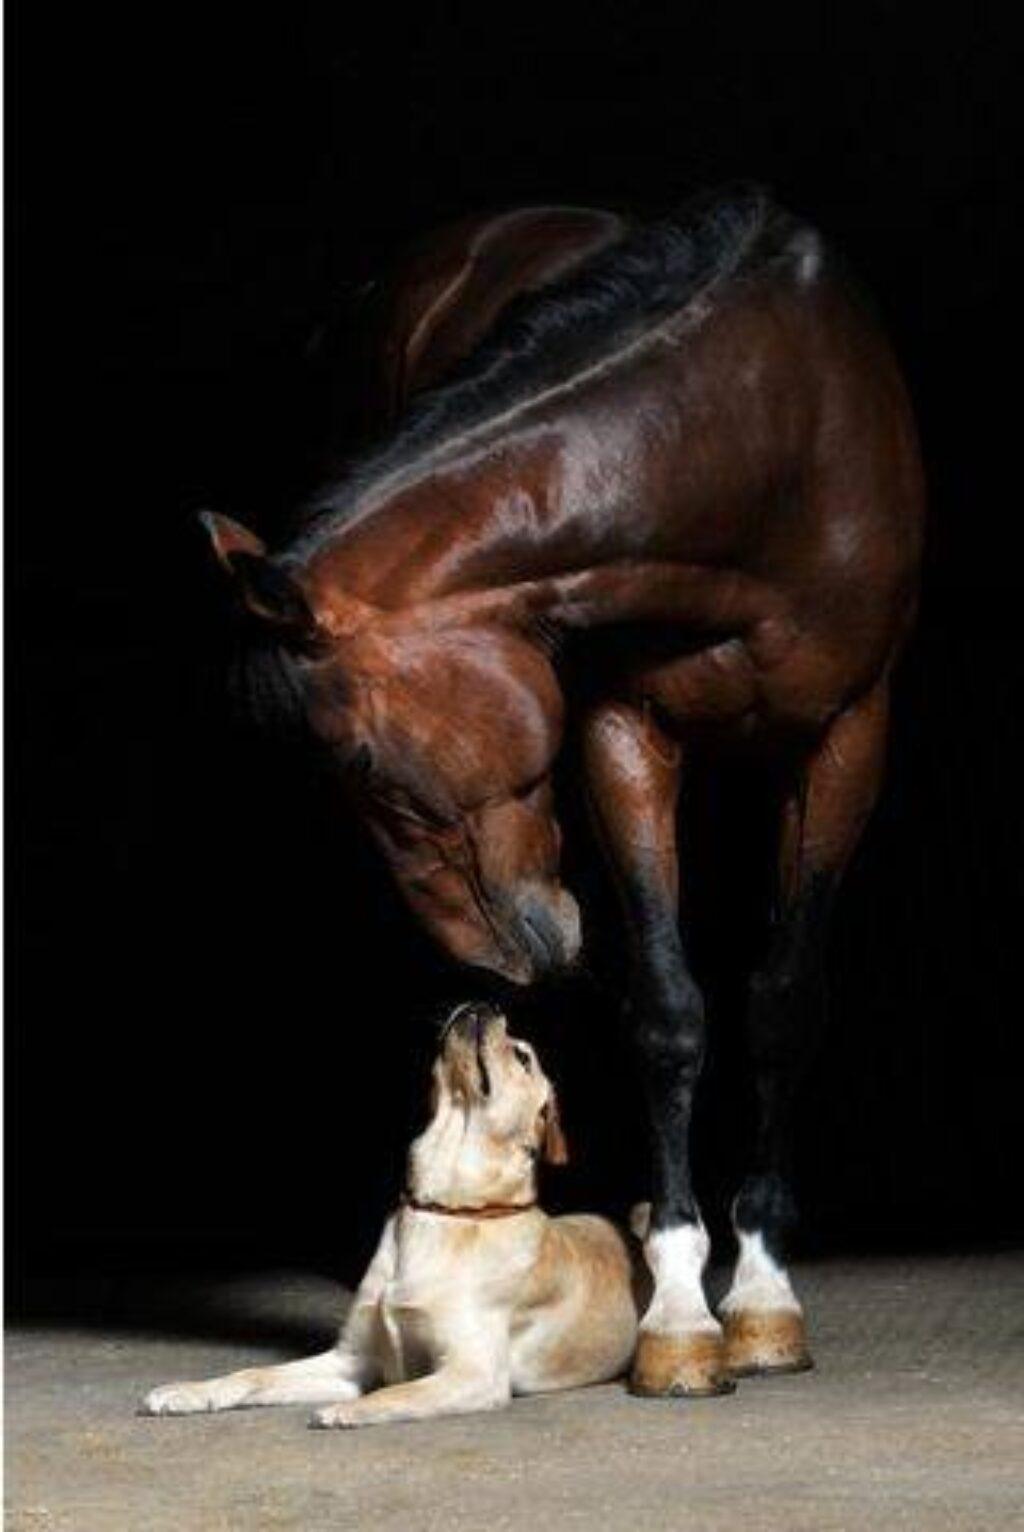 doghorse